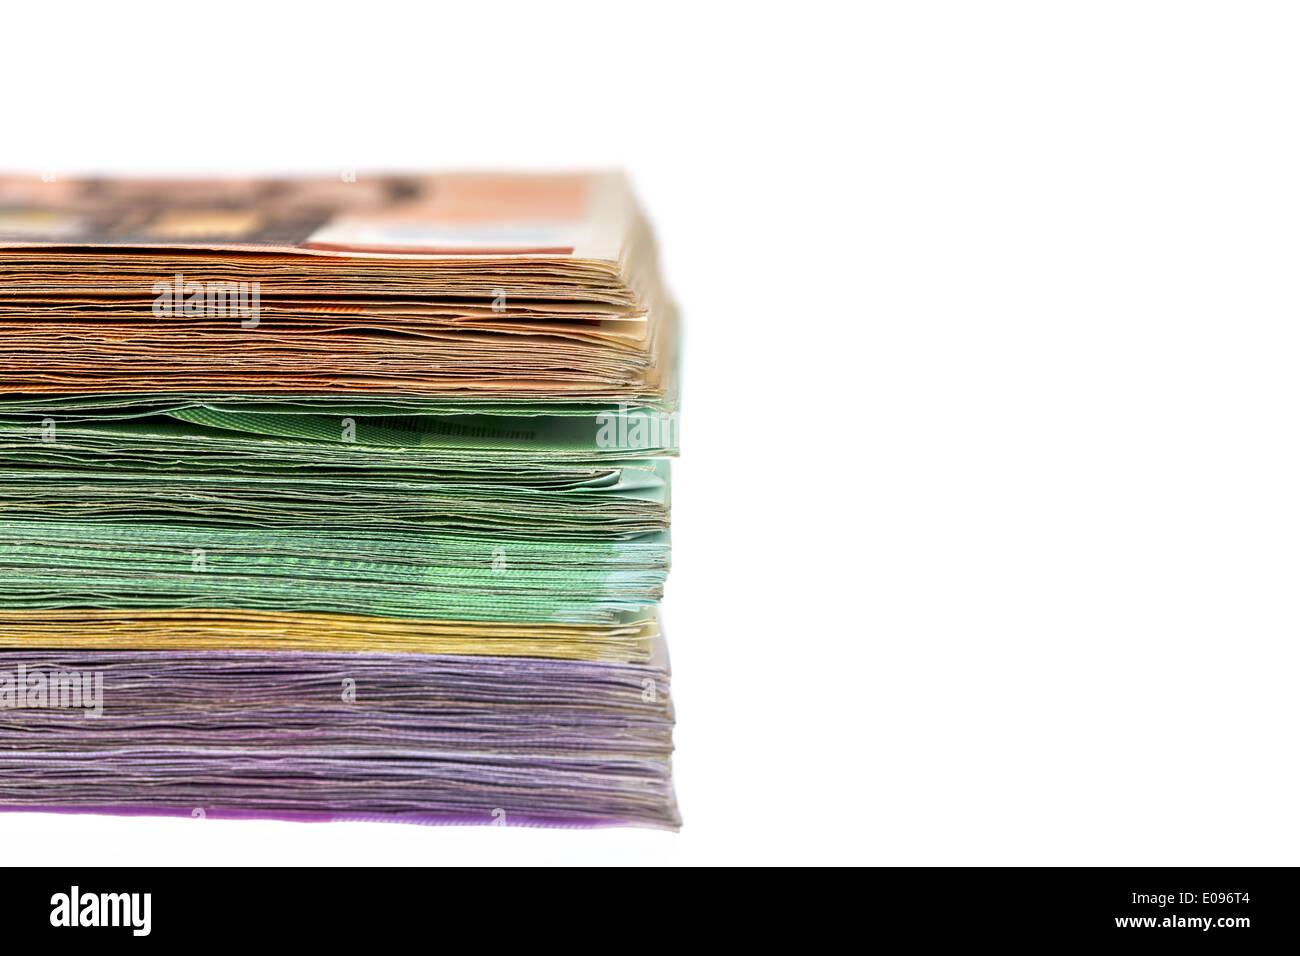 A lot of different euro of bank notes. Symbolic photo fue wealth and investment, Viele verschiedene Euro Geldscheine. Stock Photo